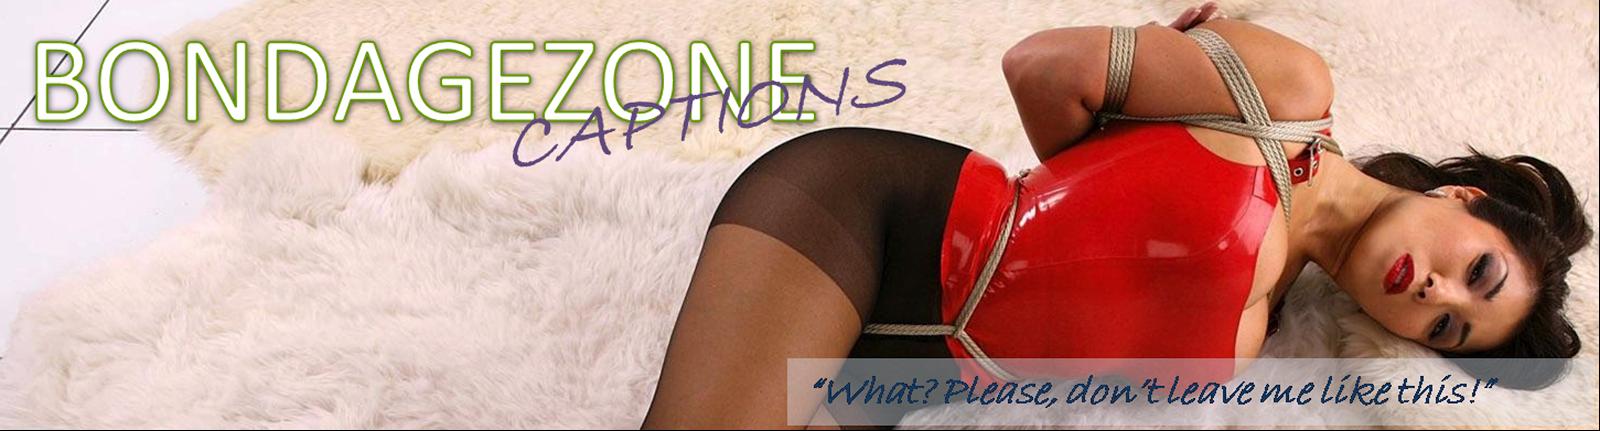 BondageZoneCaptions